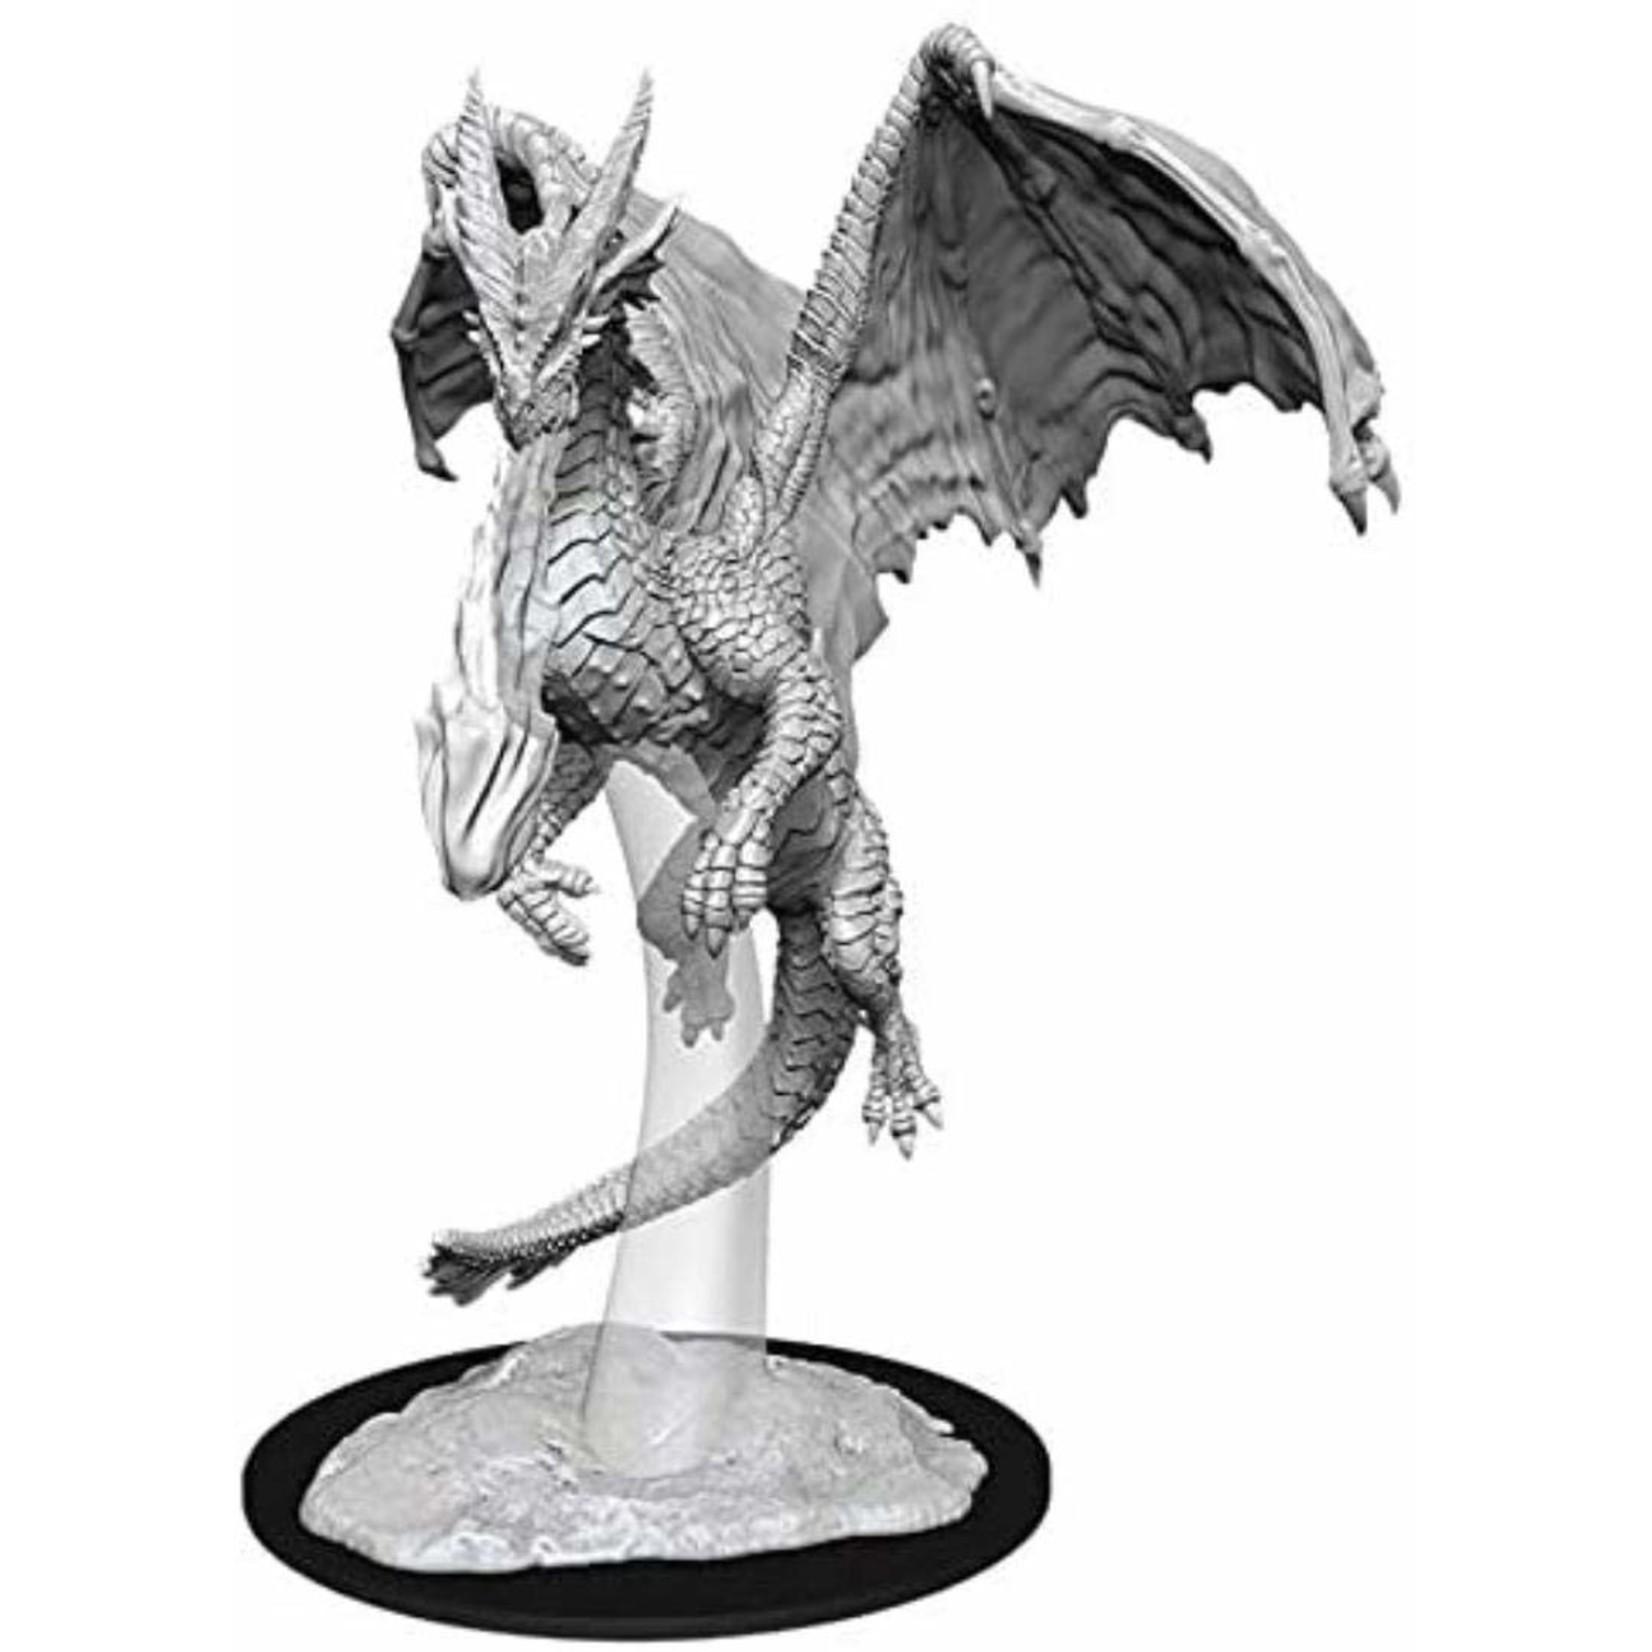 WizKids/Neca 90035 Nolzur's Young Red Dragon